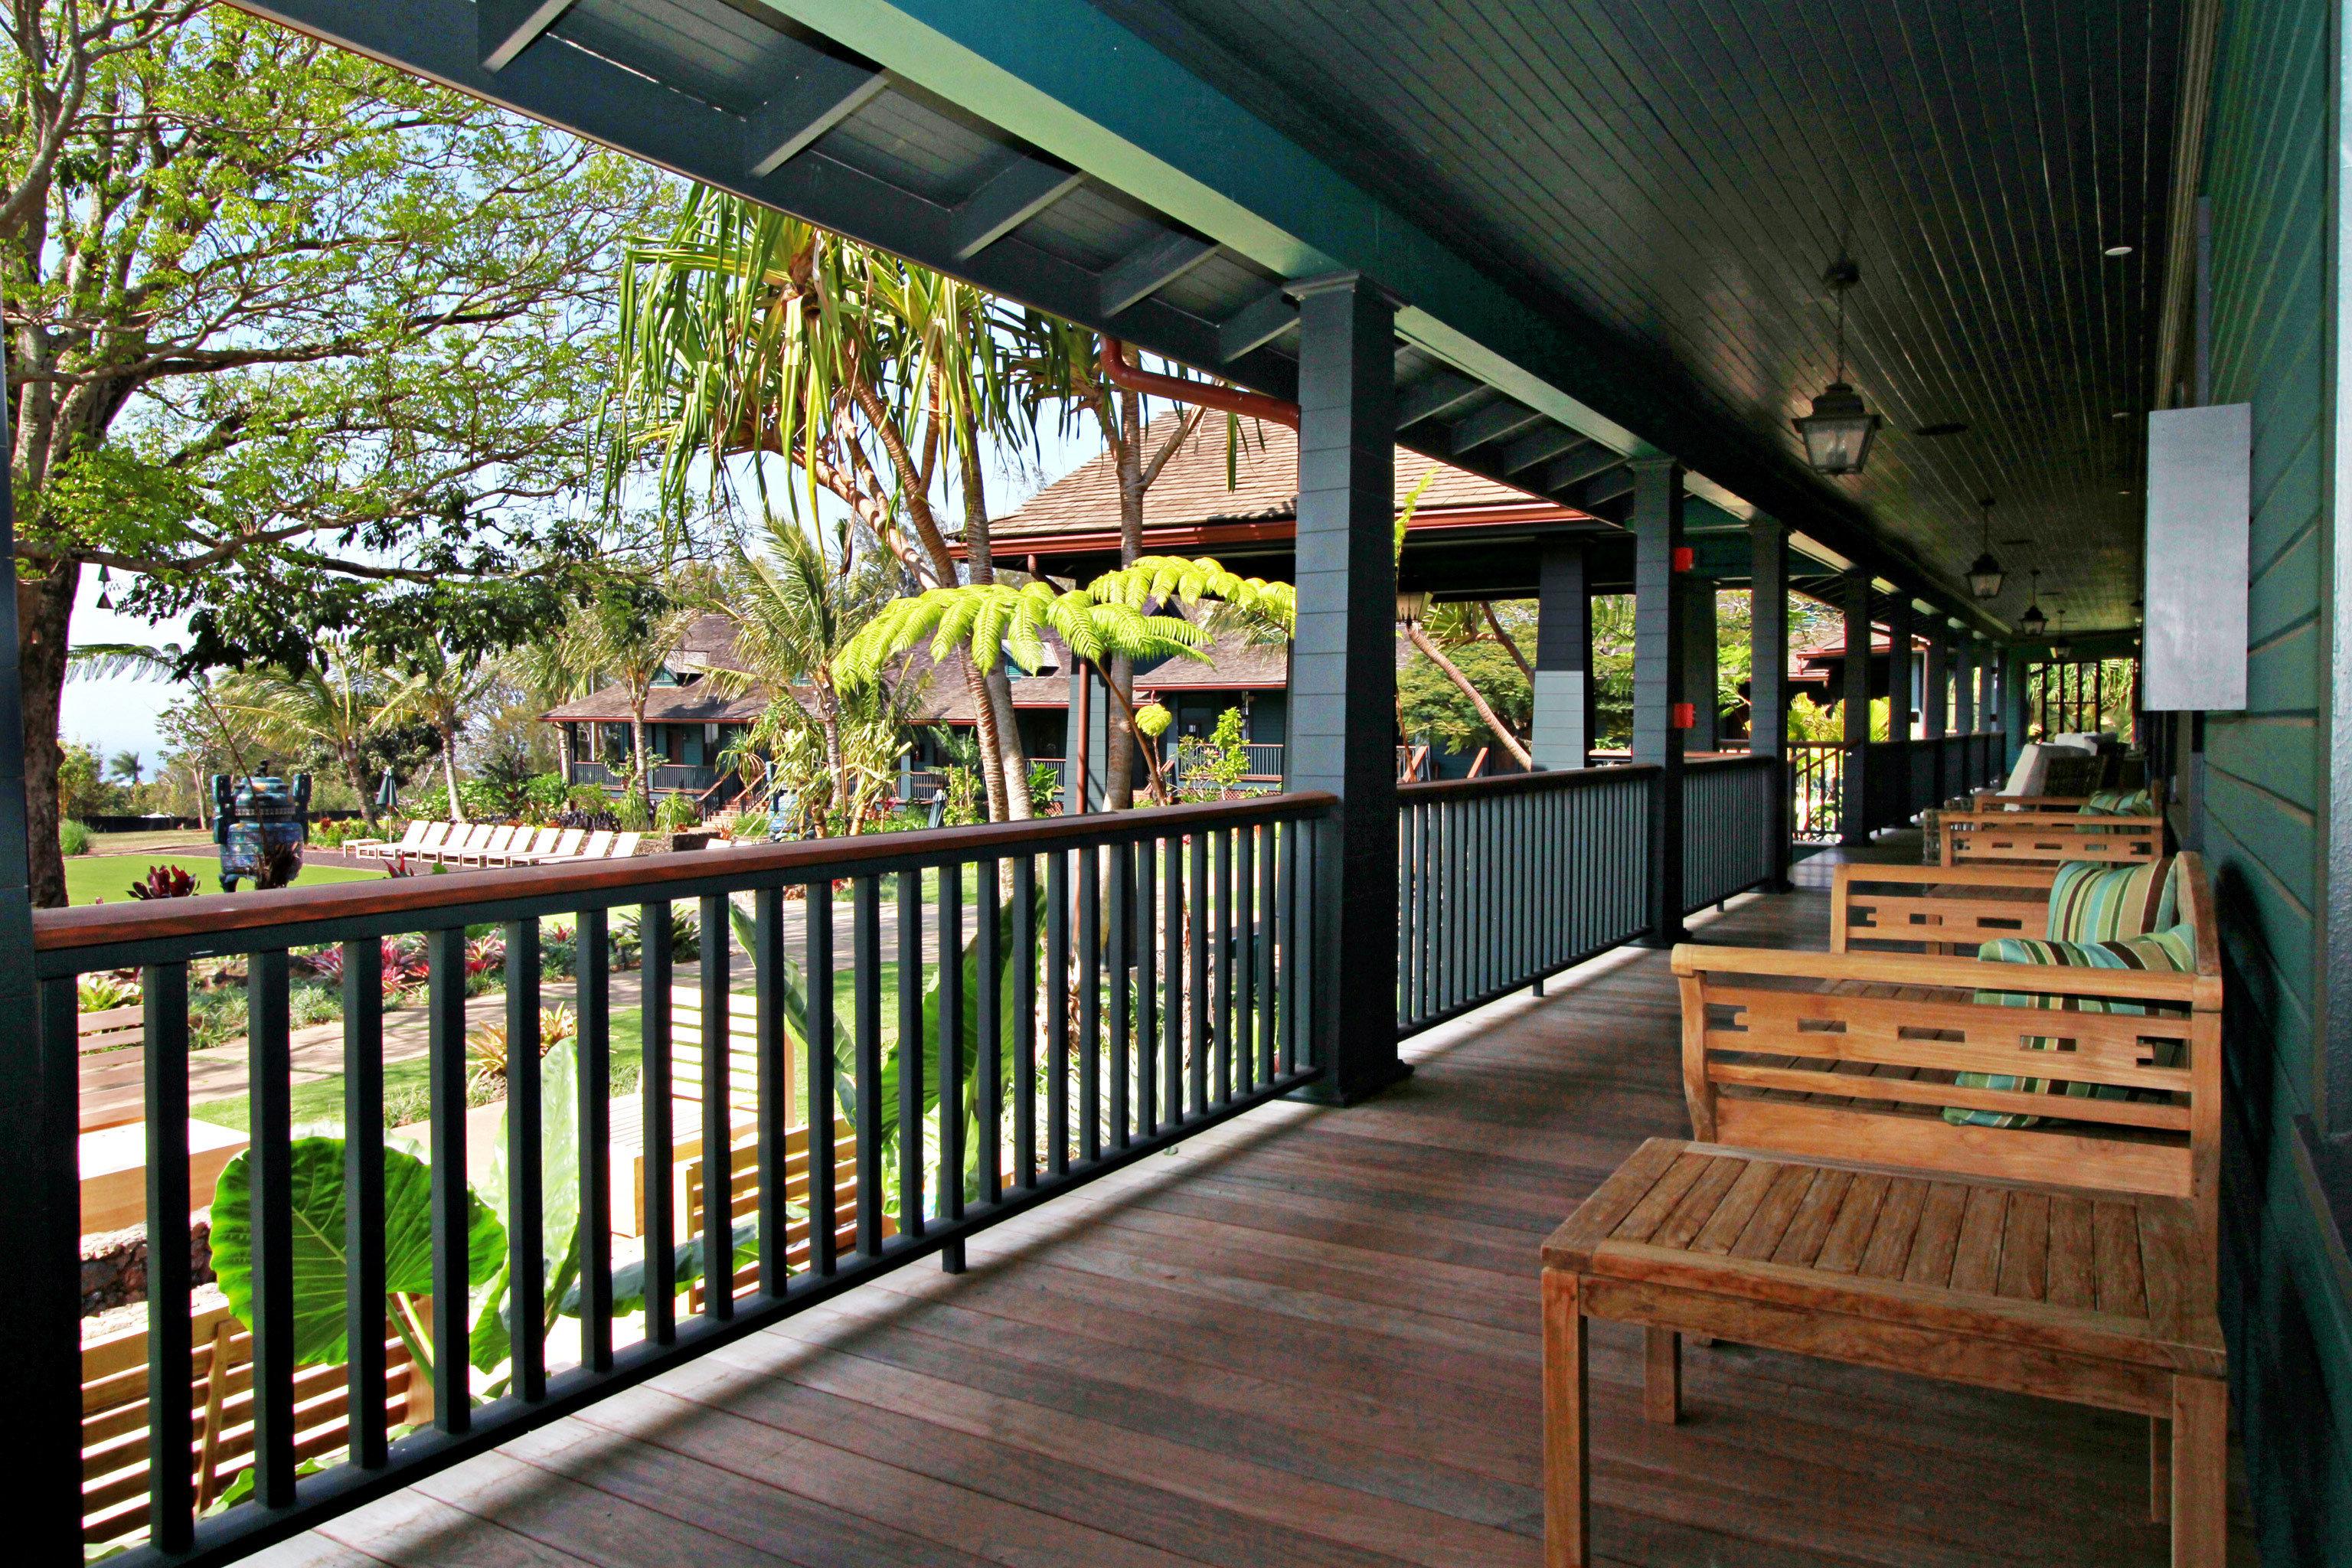 Eco Garden Outdoors Patio Scenic views building wooden porch outdoor structure restaurant Deck